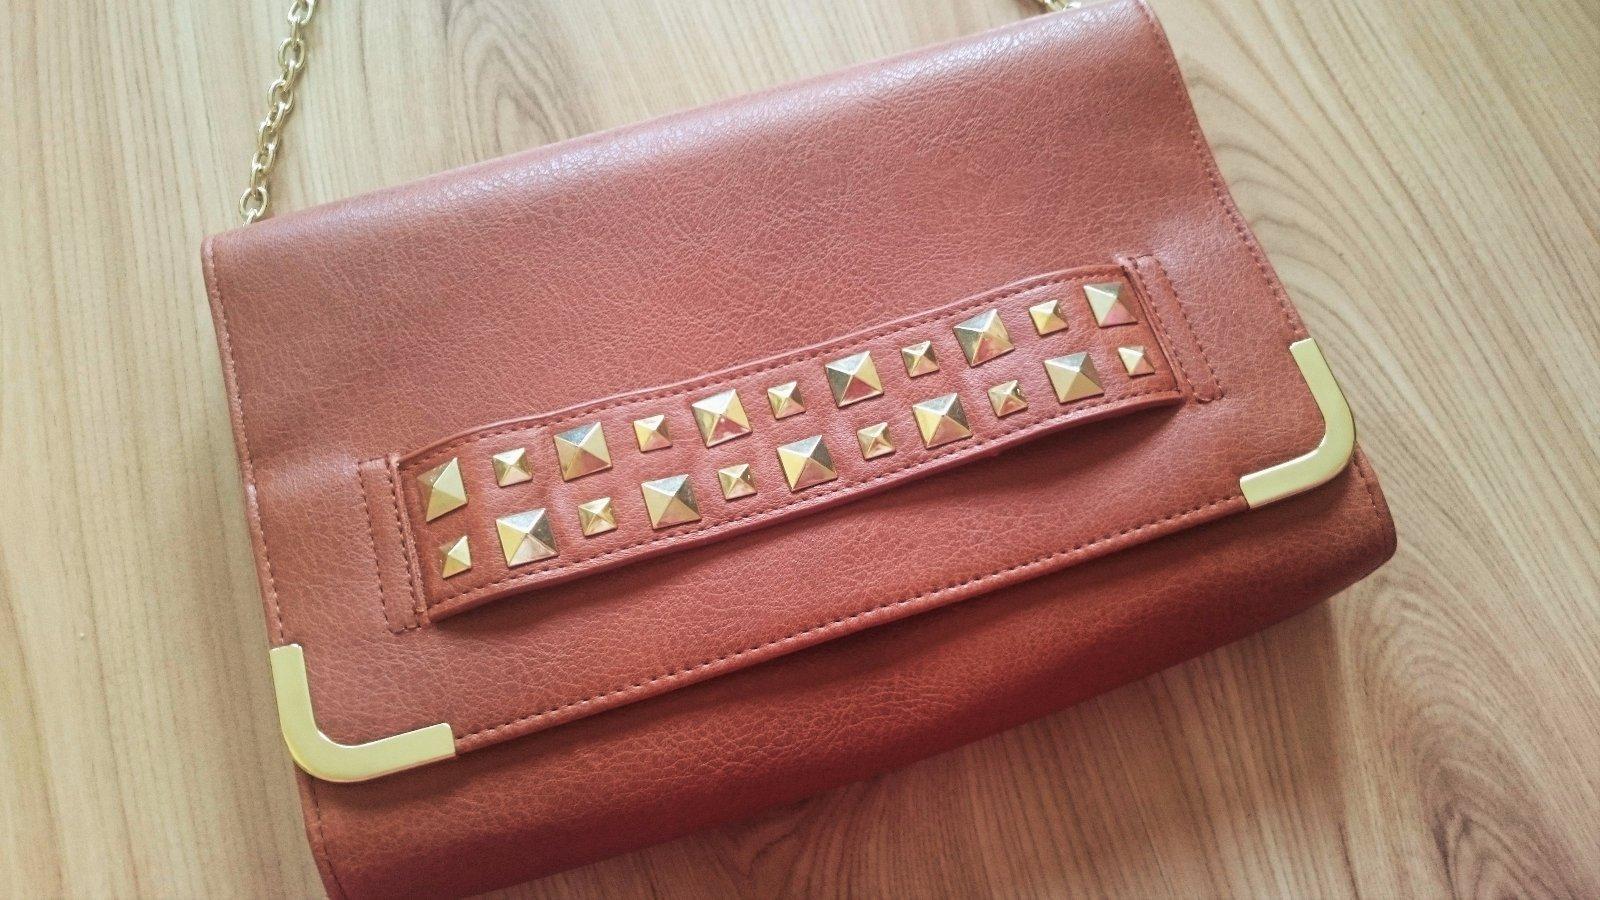 listová kabelka - 2 spôsoby nosenia - Obrázok č. 2